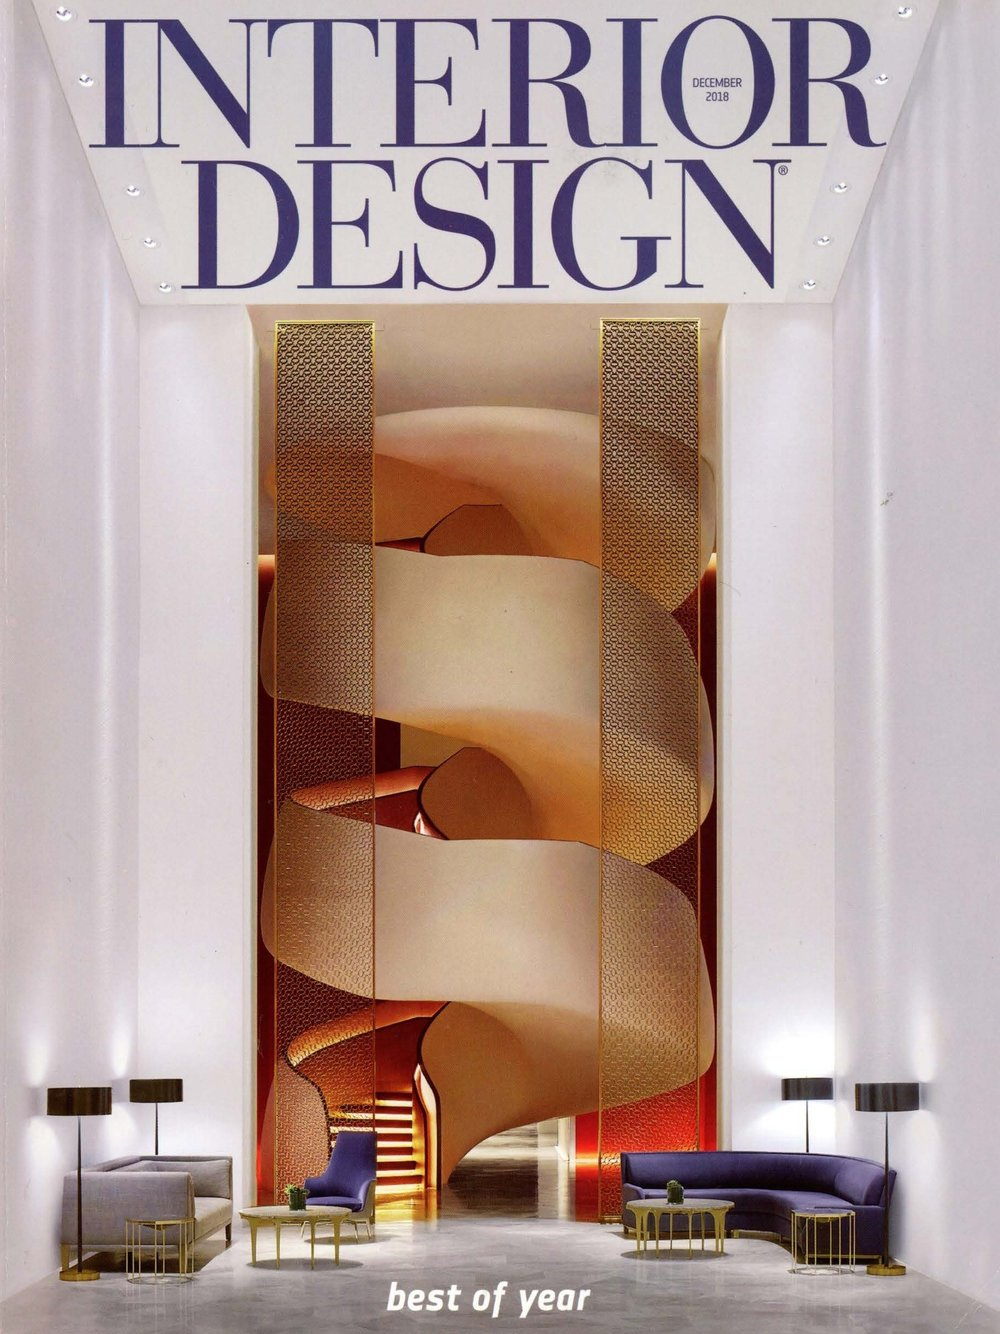 Interior+Design+-+December+%2718+-+BHDM+Design+%281%29_Page_1.jpg